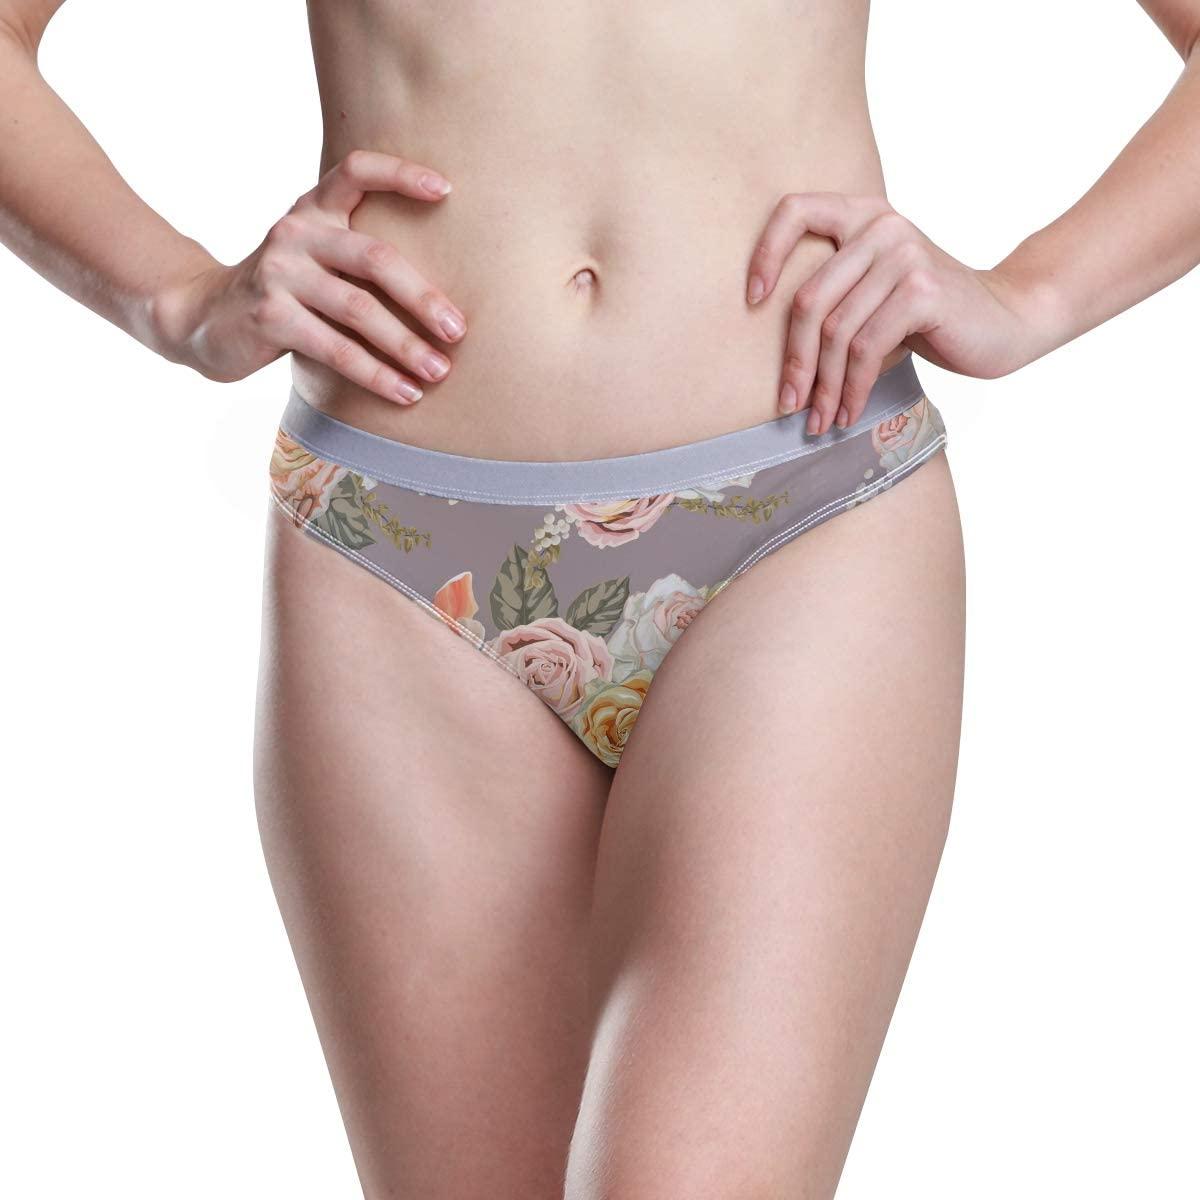 Womens Underwear Hipster Panties Rose Seamless Pattern Retro Styles Ladies Hi Cut Bikini Cheeky Panty